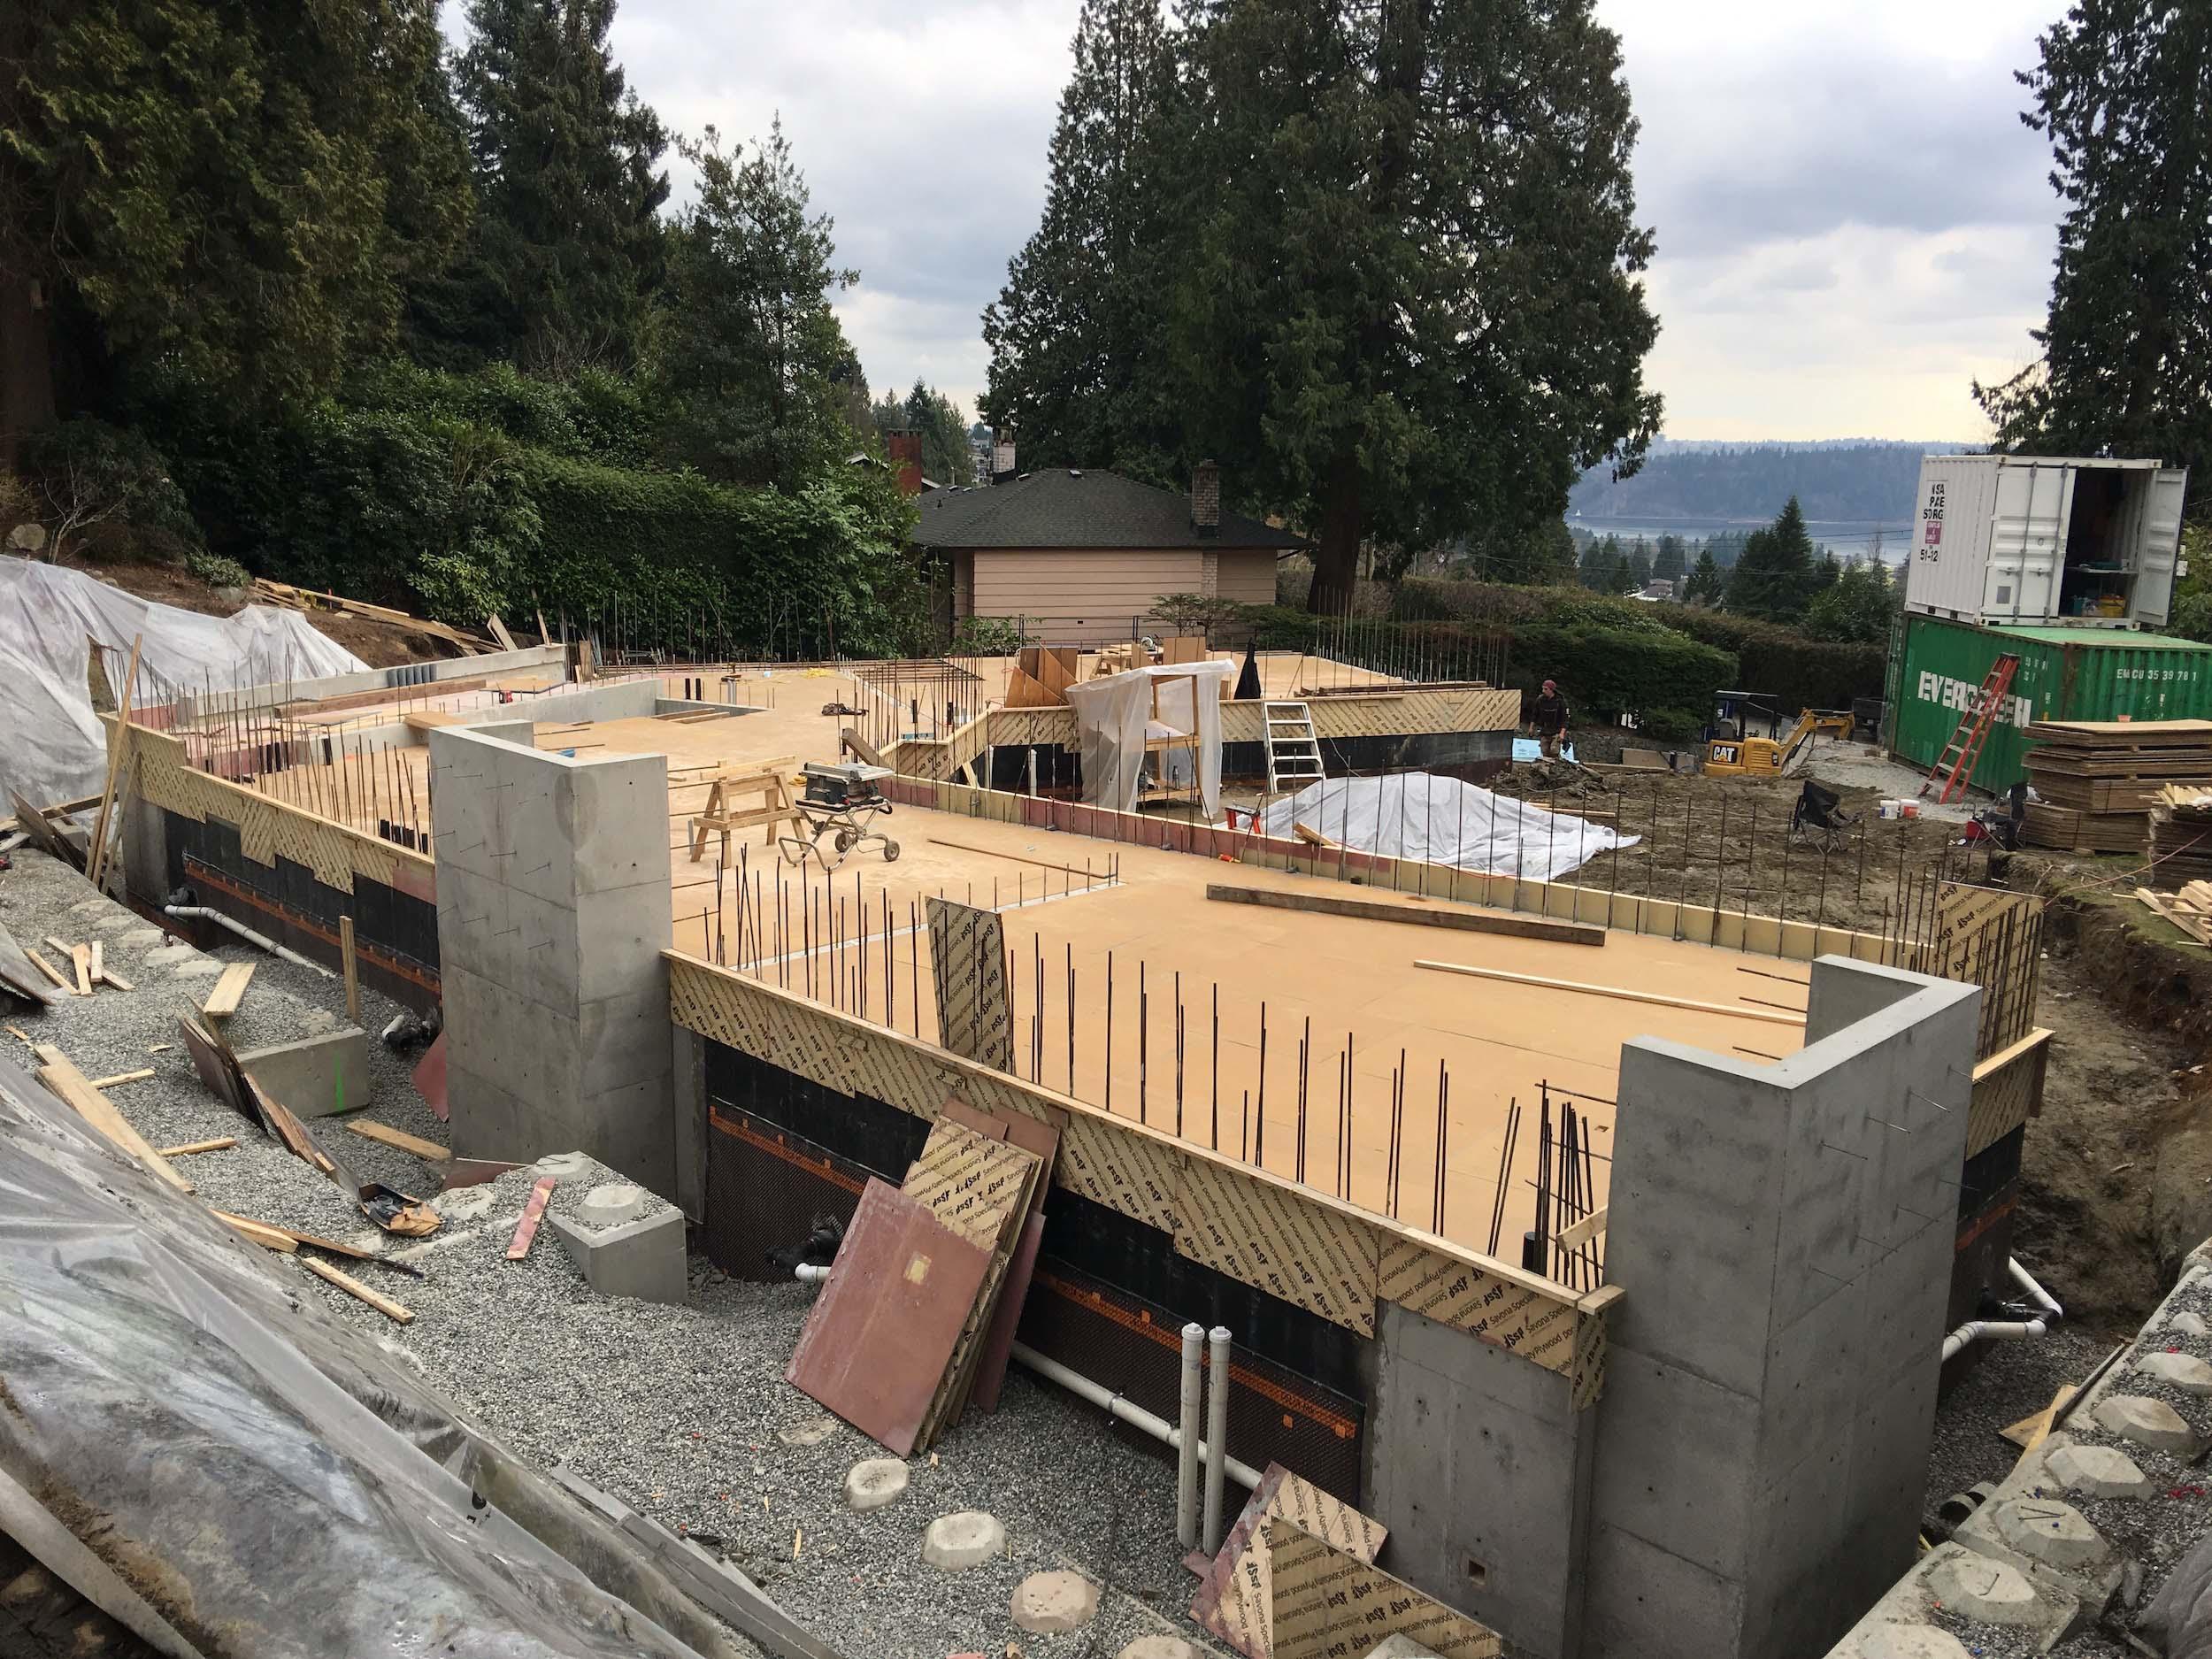 Postle_Construction_ConcreteForming30.jpg